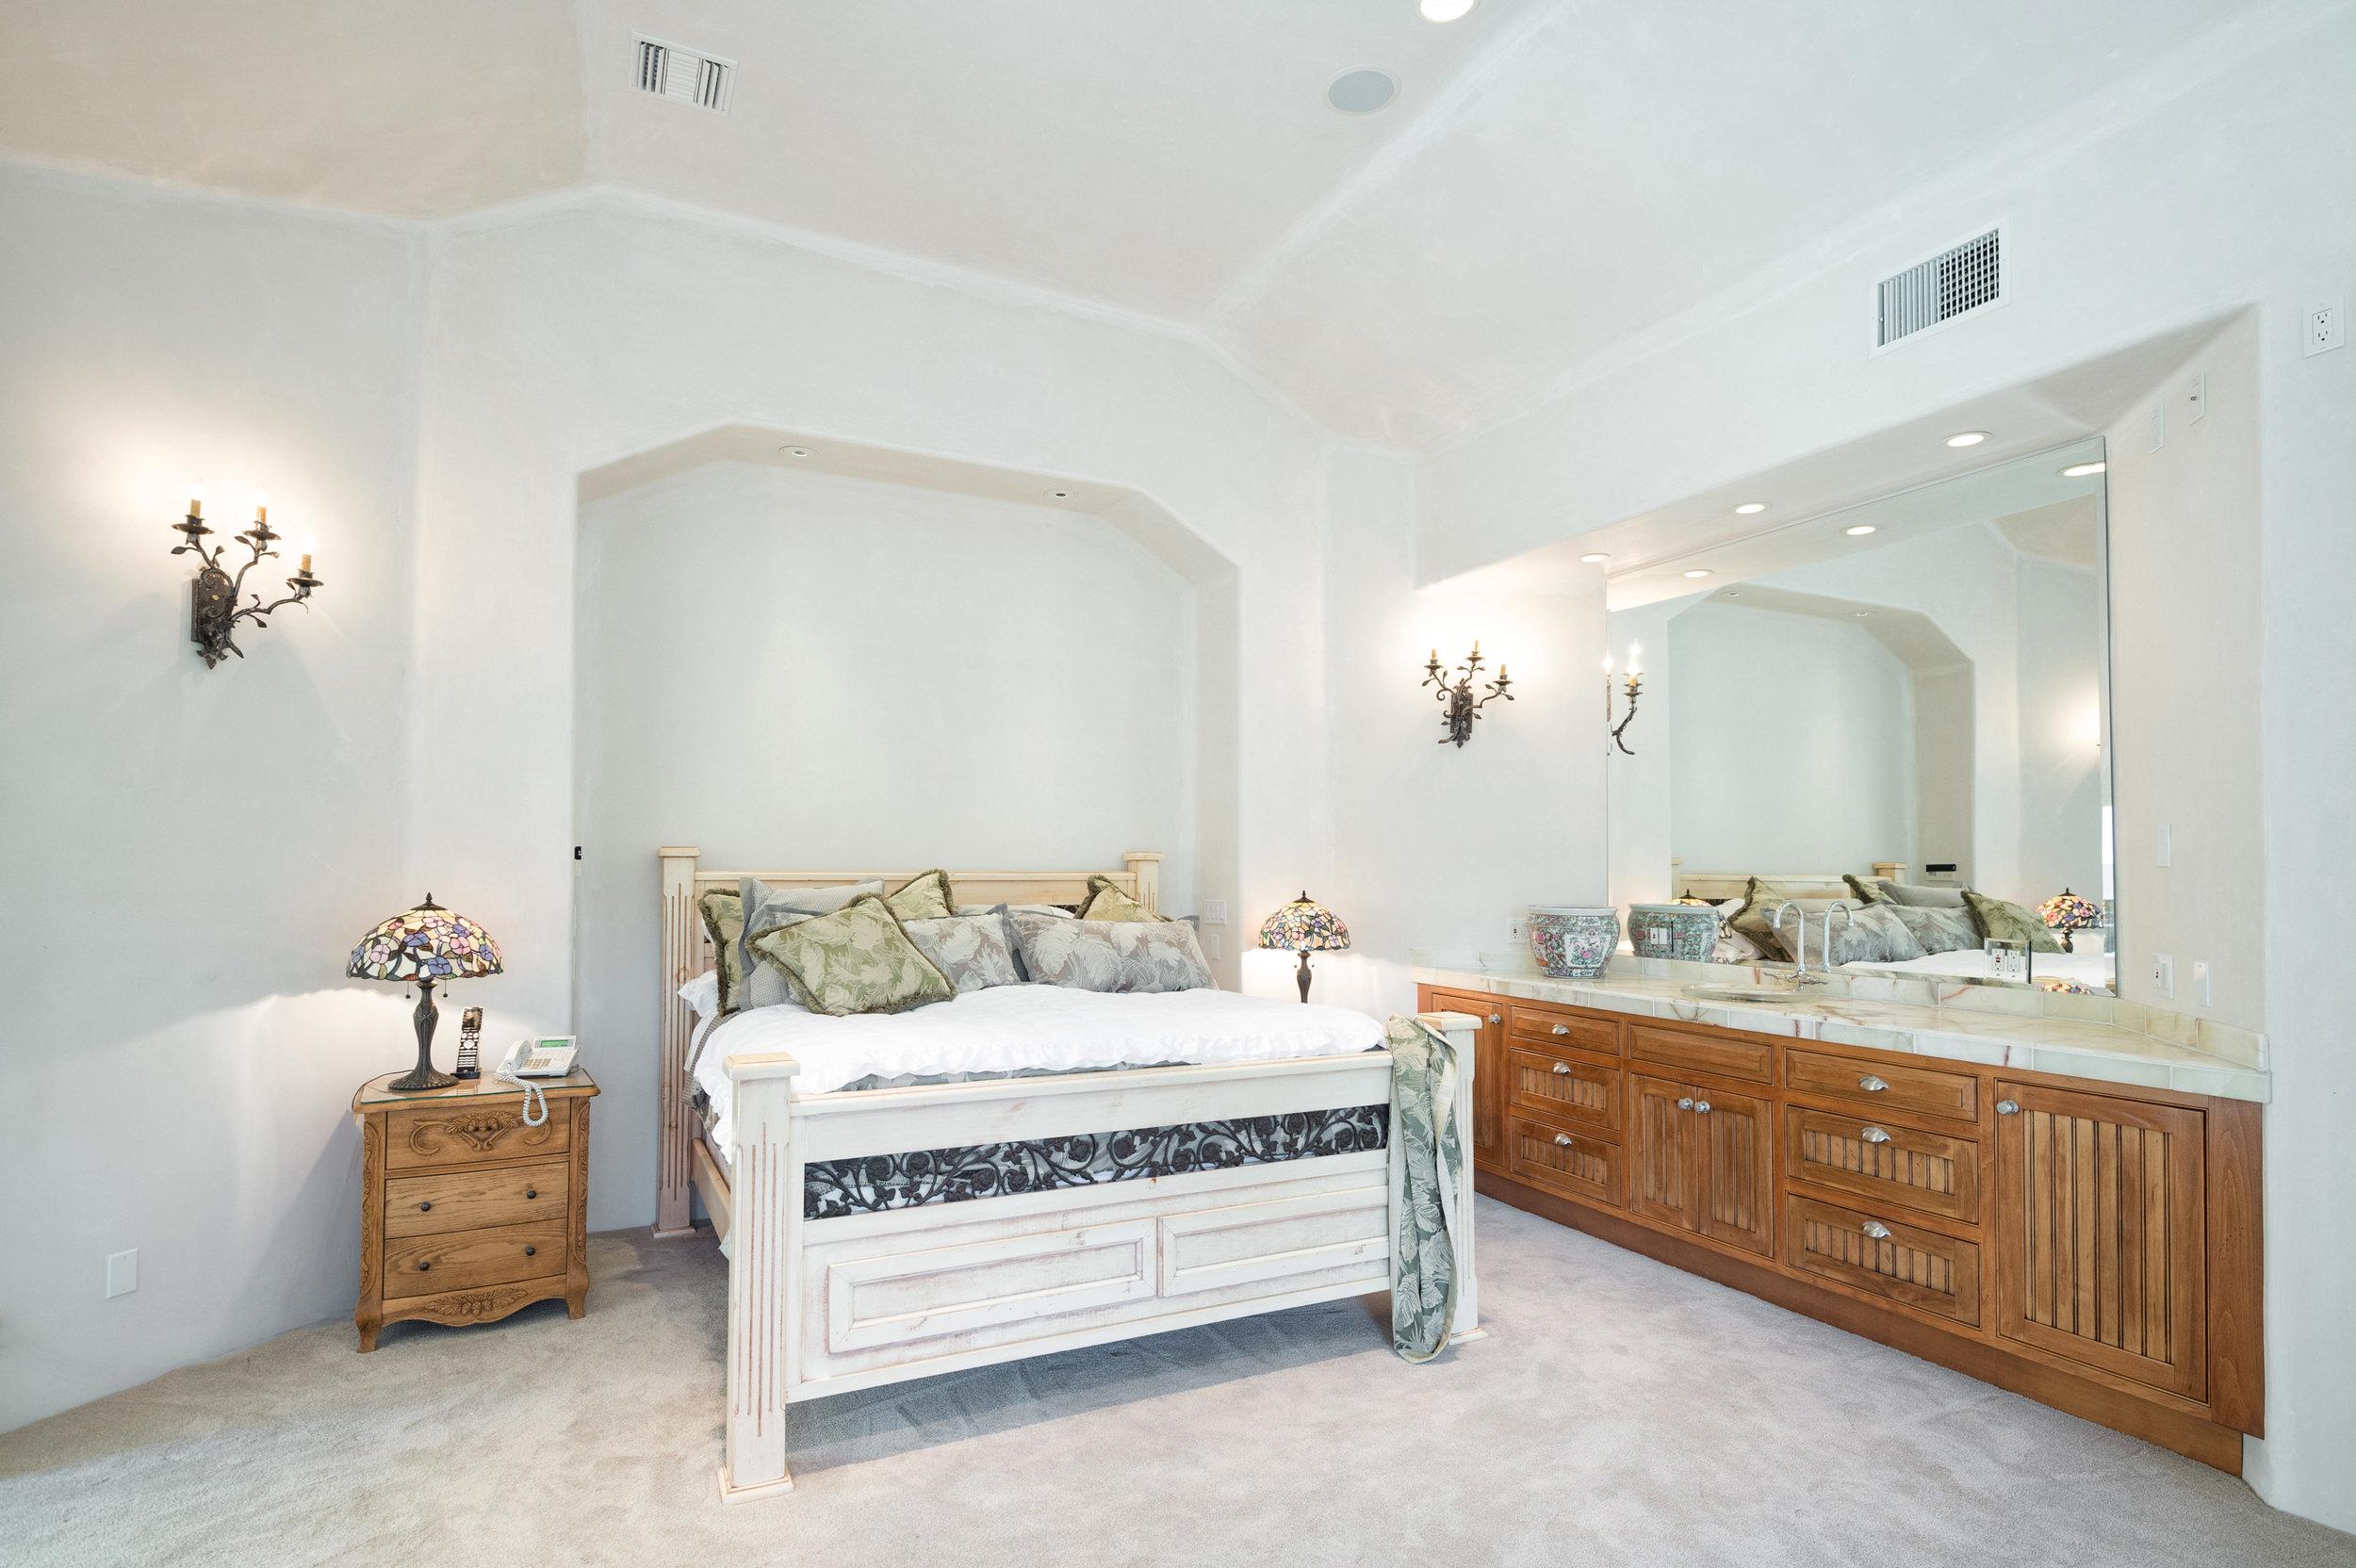 013 master bedroom  10 6405 bonsall Malibu For Sale The Malibu Life Team Luxury Real Estate.jpg